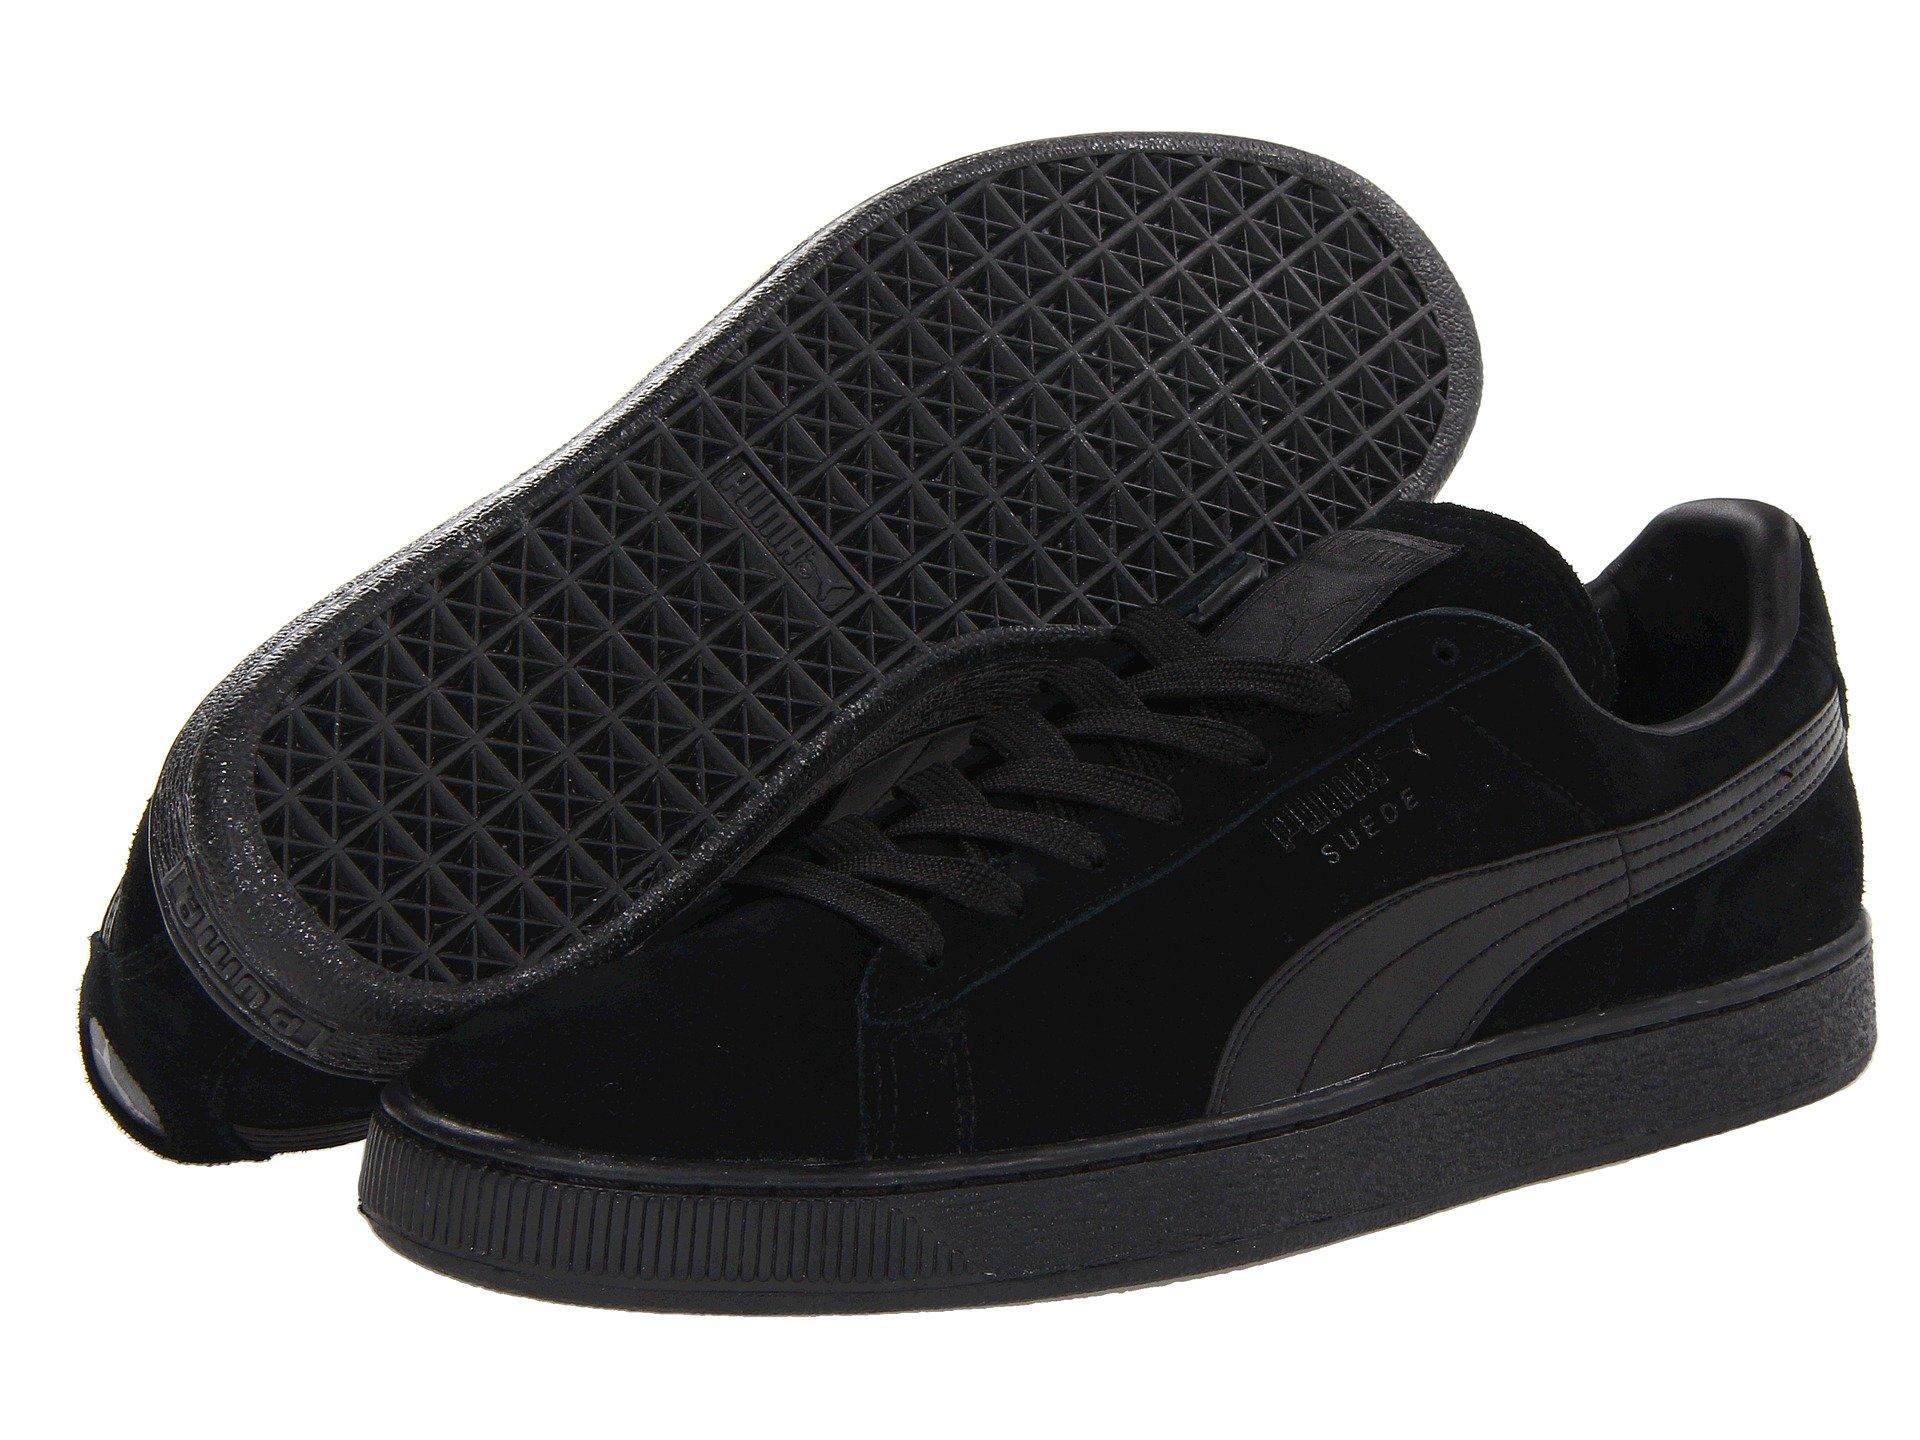 puma shoes zappos